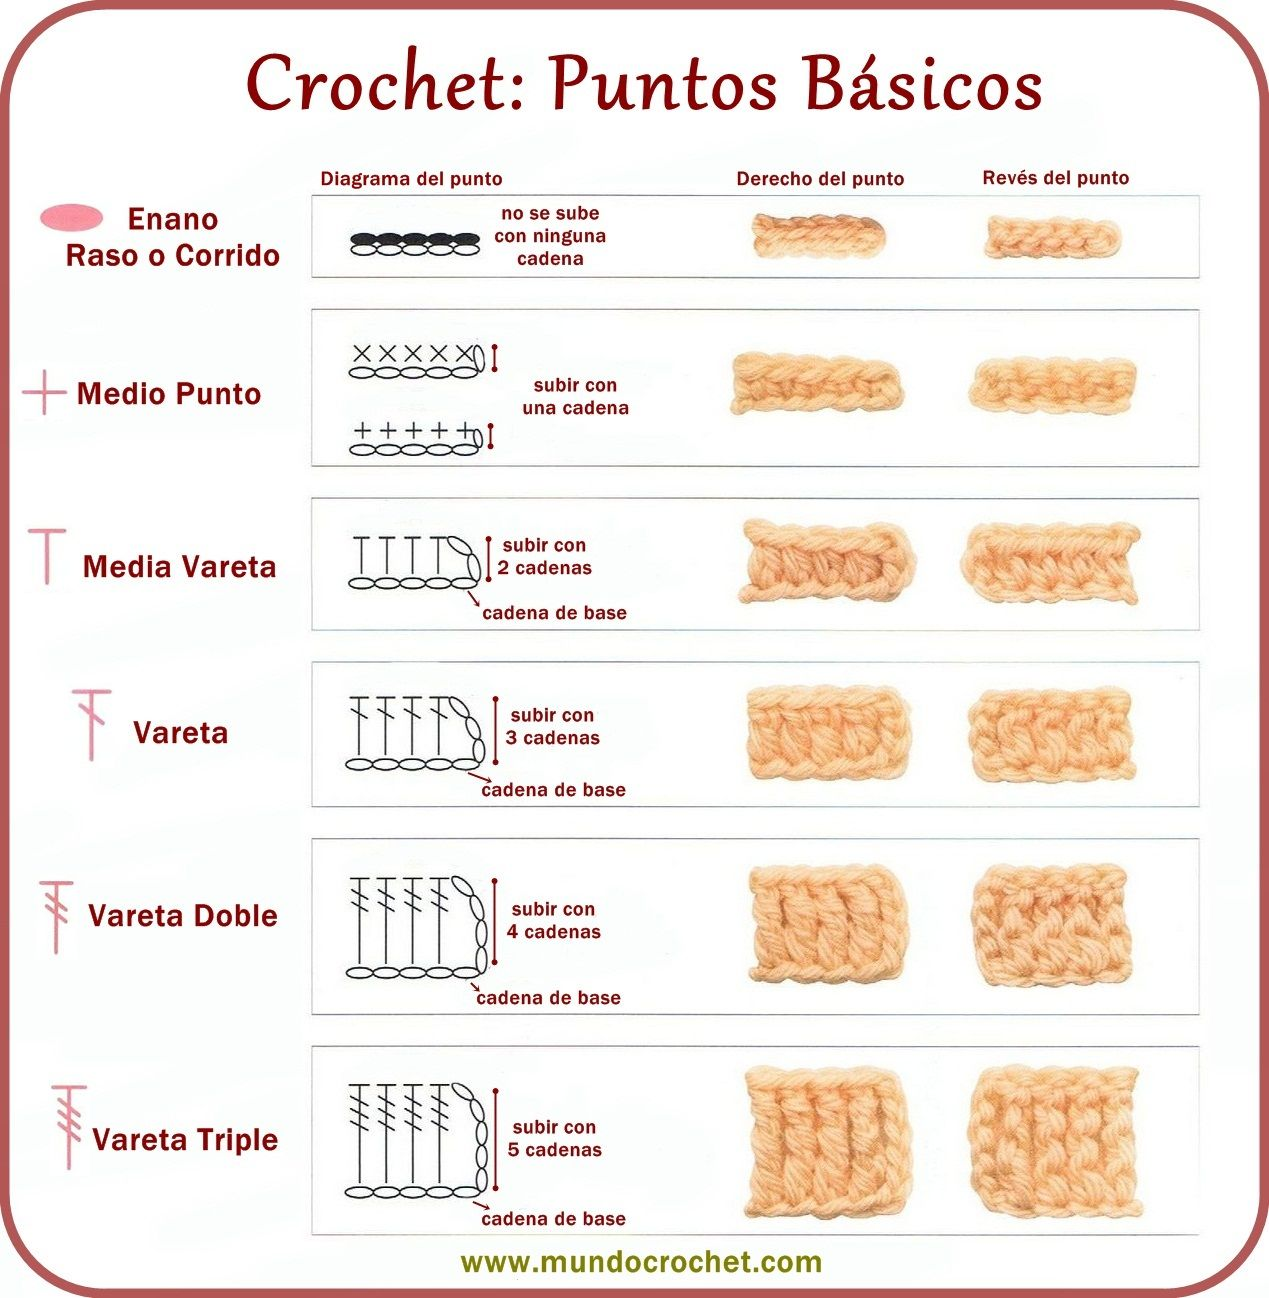 Crochet puntos basicos | crochet | Pinterest